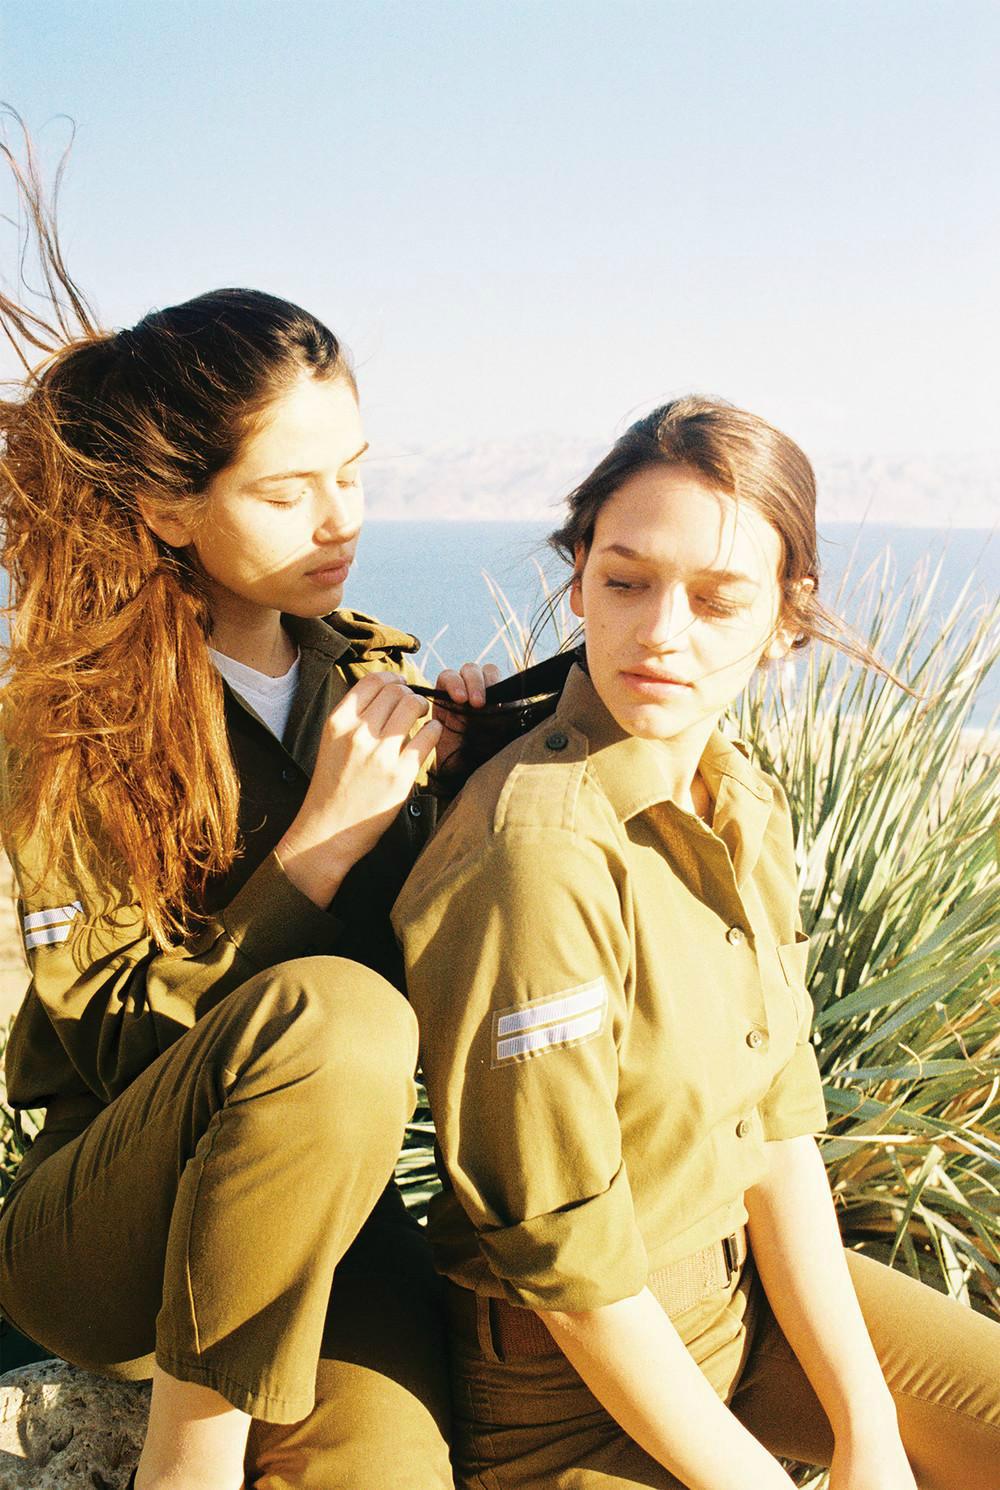 Vice: Defiant Feminity of Israel's Female Soldiers